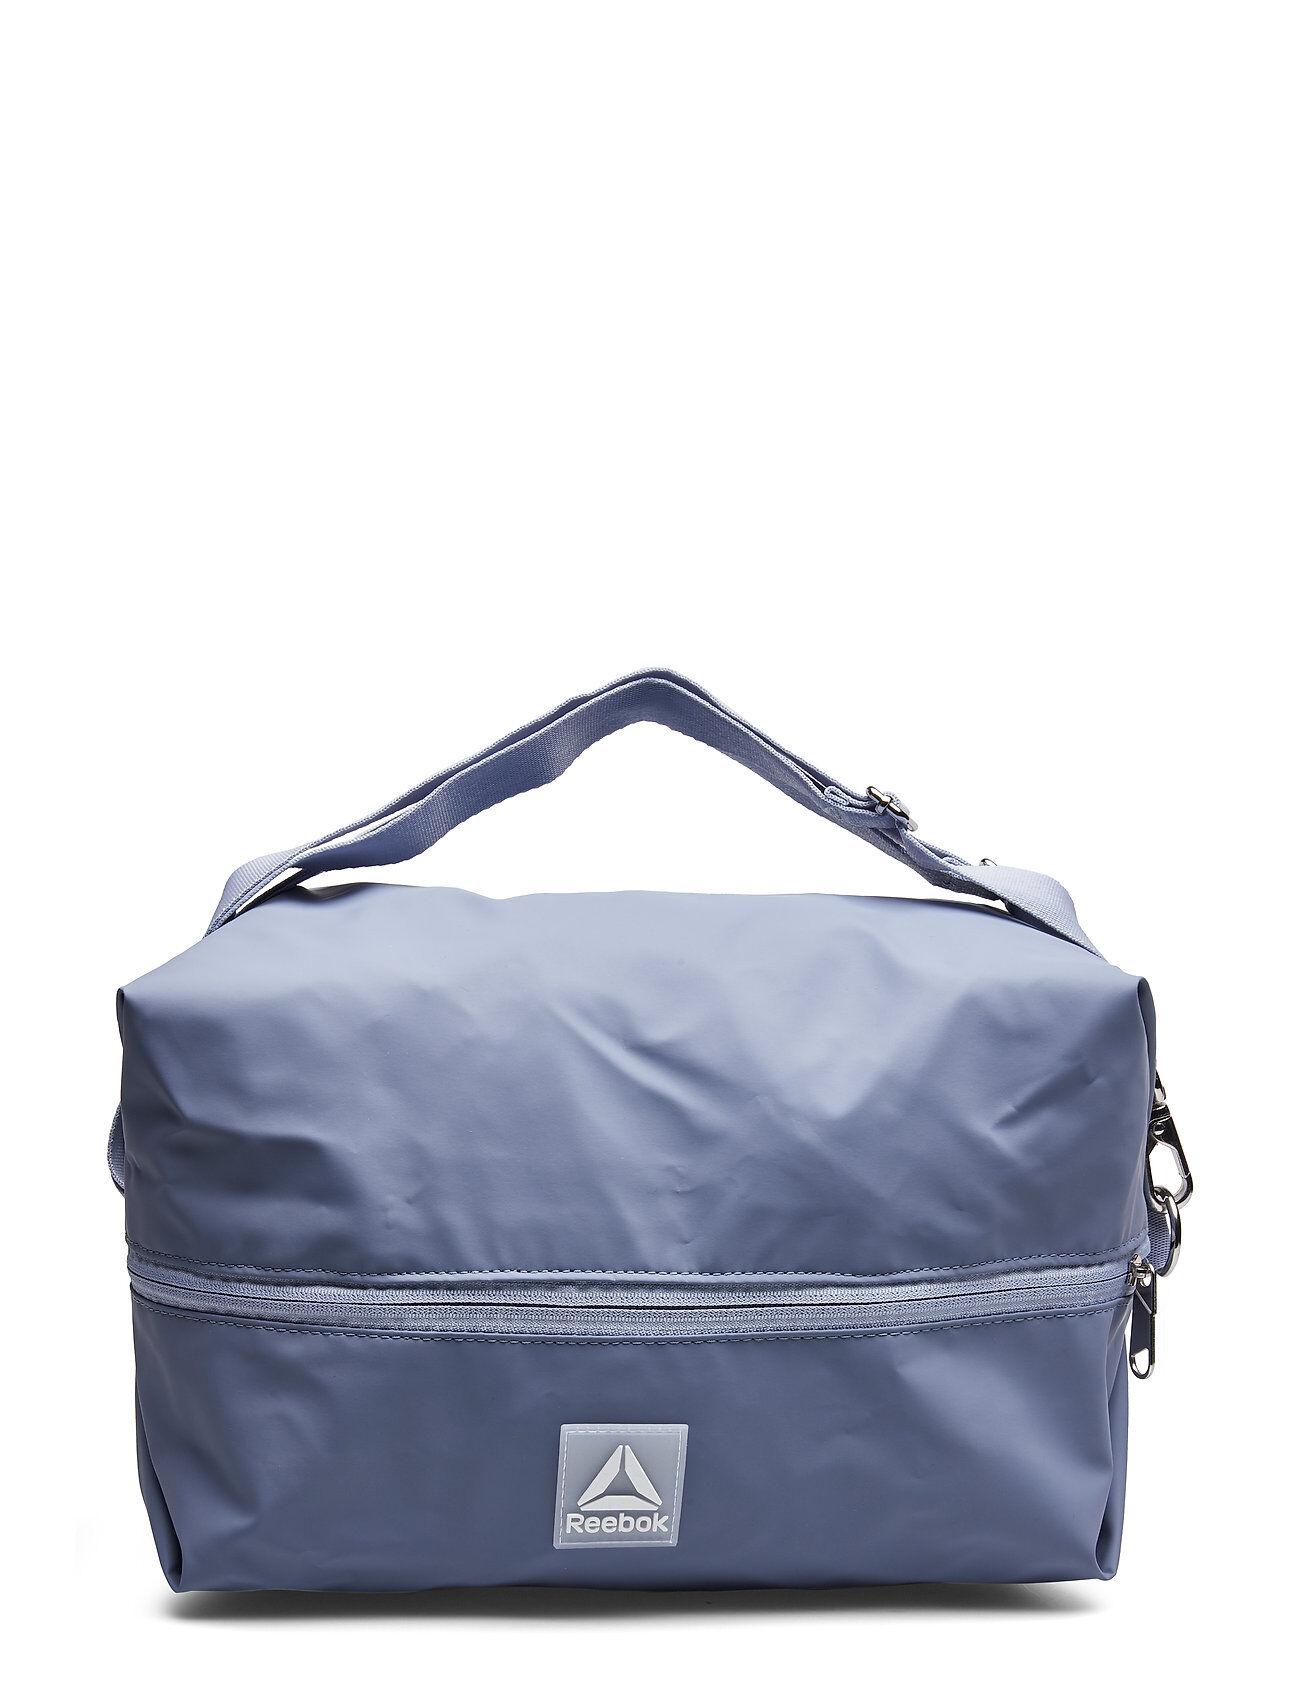 Reebok Performance W Studio Imagiro Bags Backpacks Casual Backpacks Sininen Reebok Performance